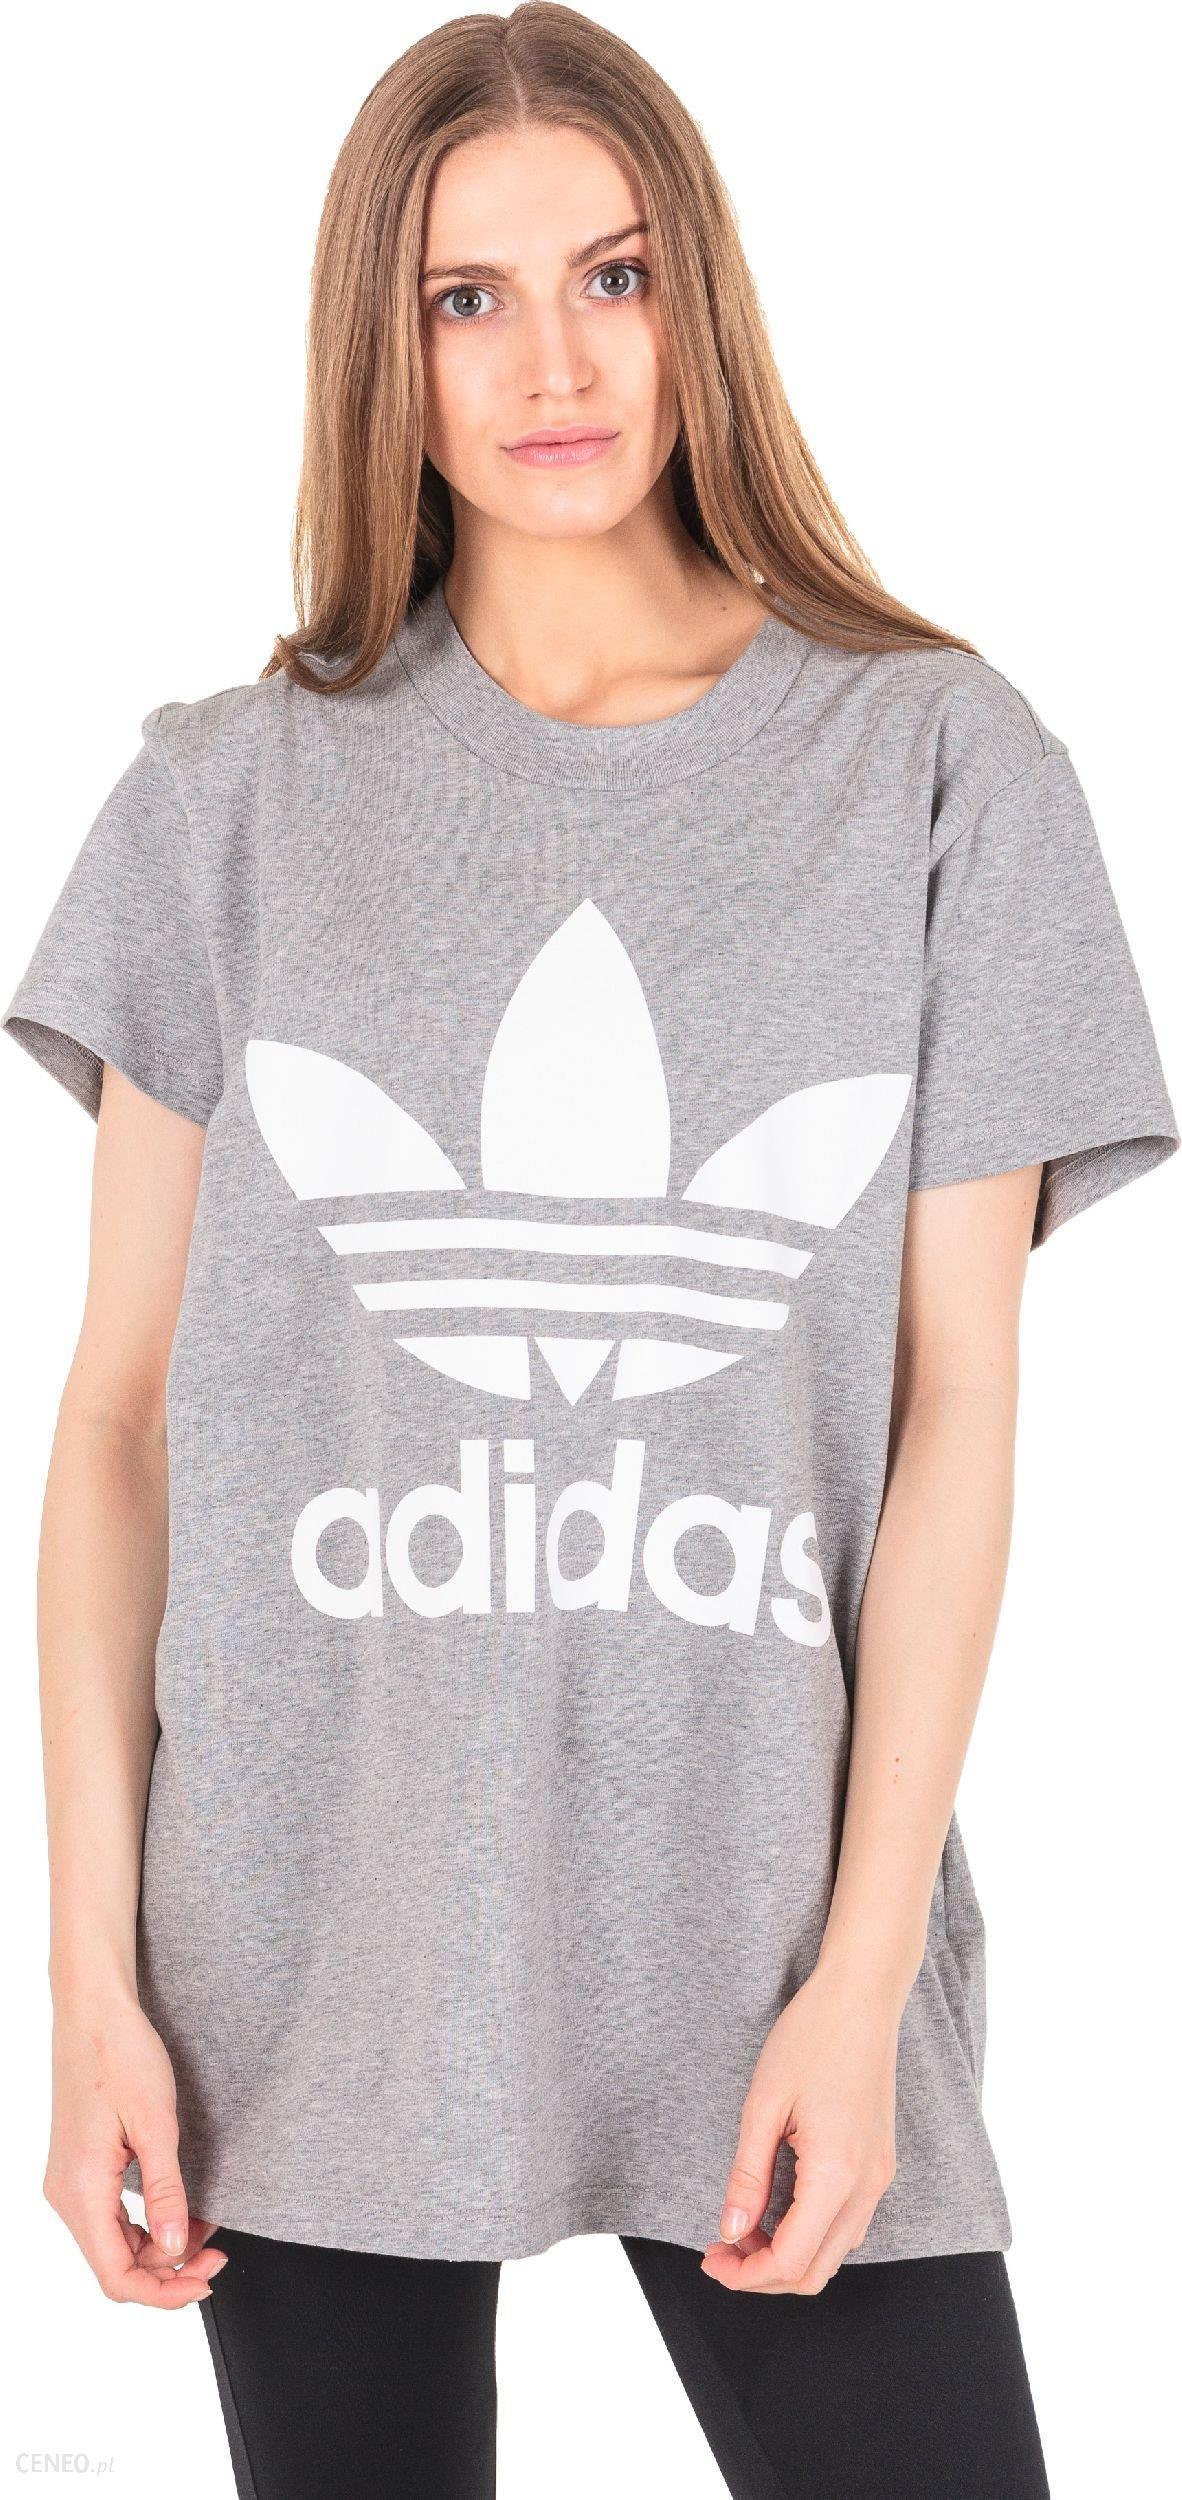 Adidas Koszulka damska Originals Trefoil Tee CY4762 CY4762 szara r. 36 (CY4762) Ceny i opinie Ceneo.pl